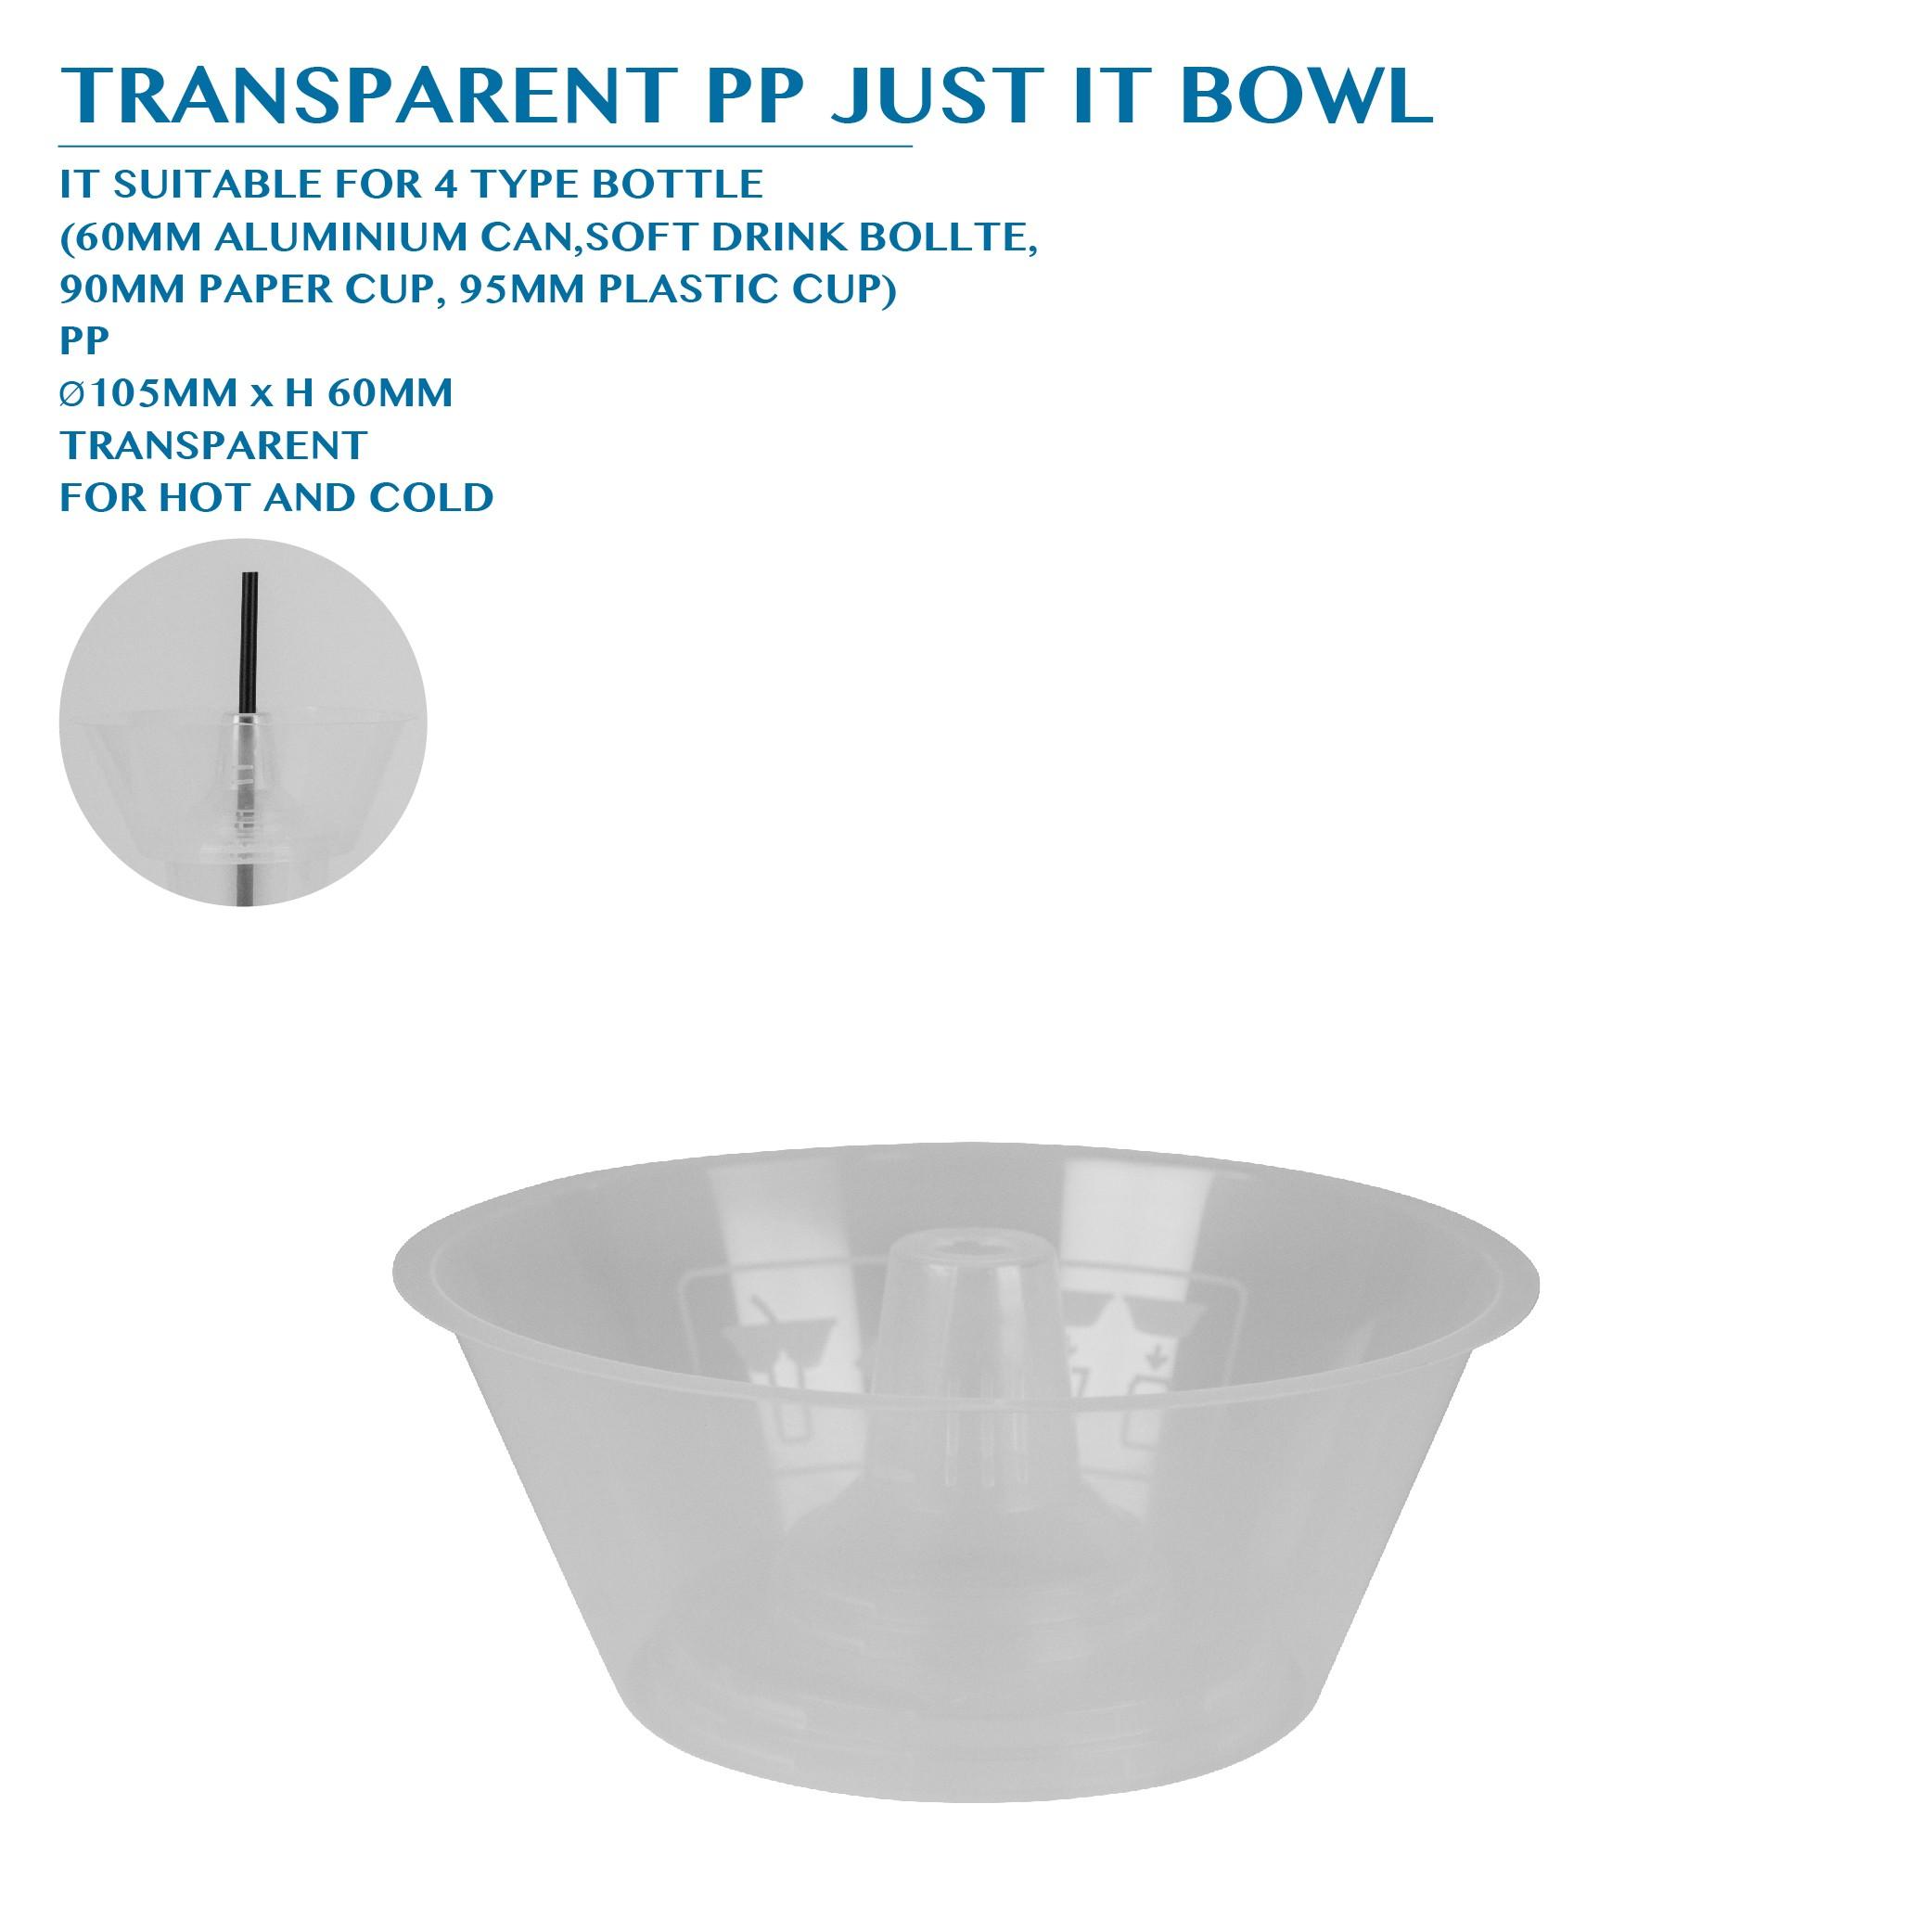 PRE-ORDER TRANSPARENT PP JUST IT BOWL